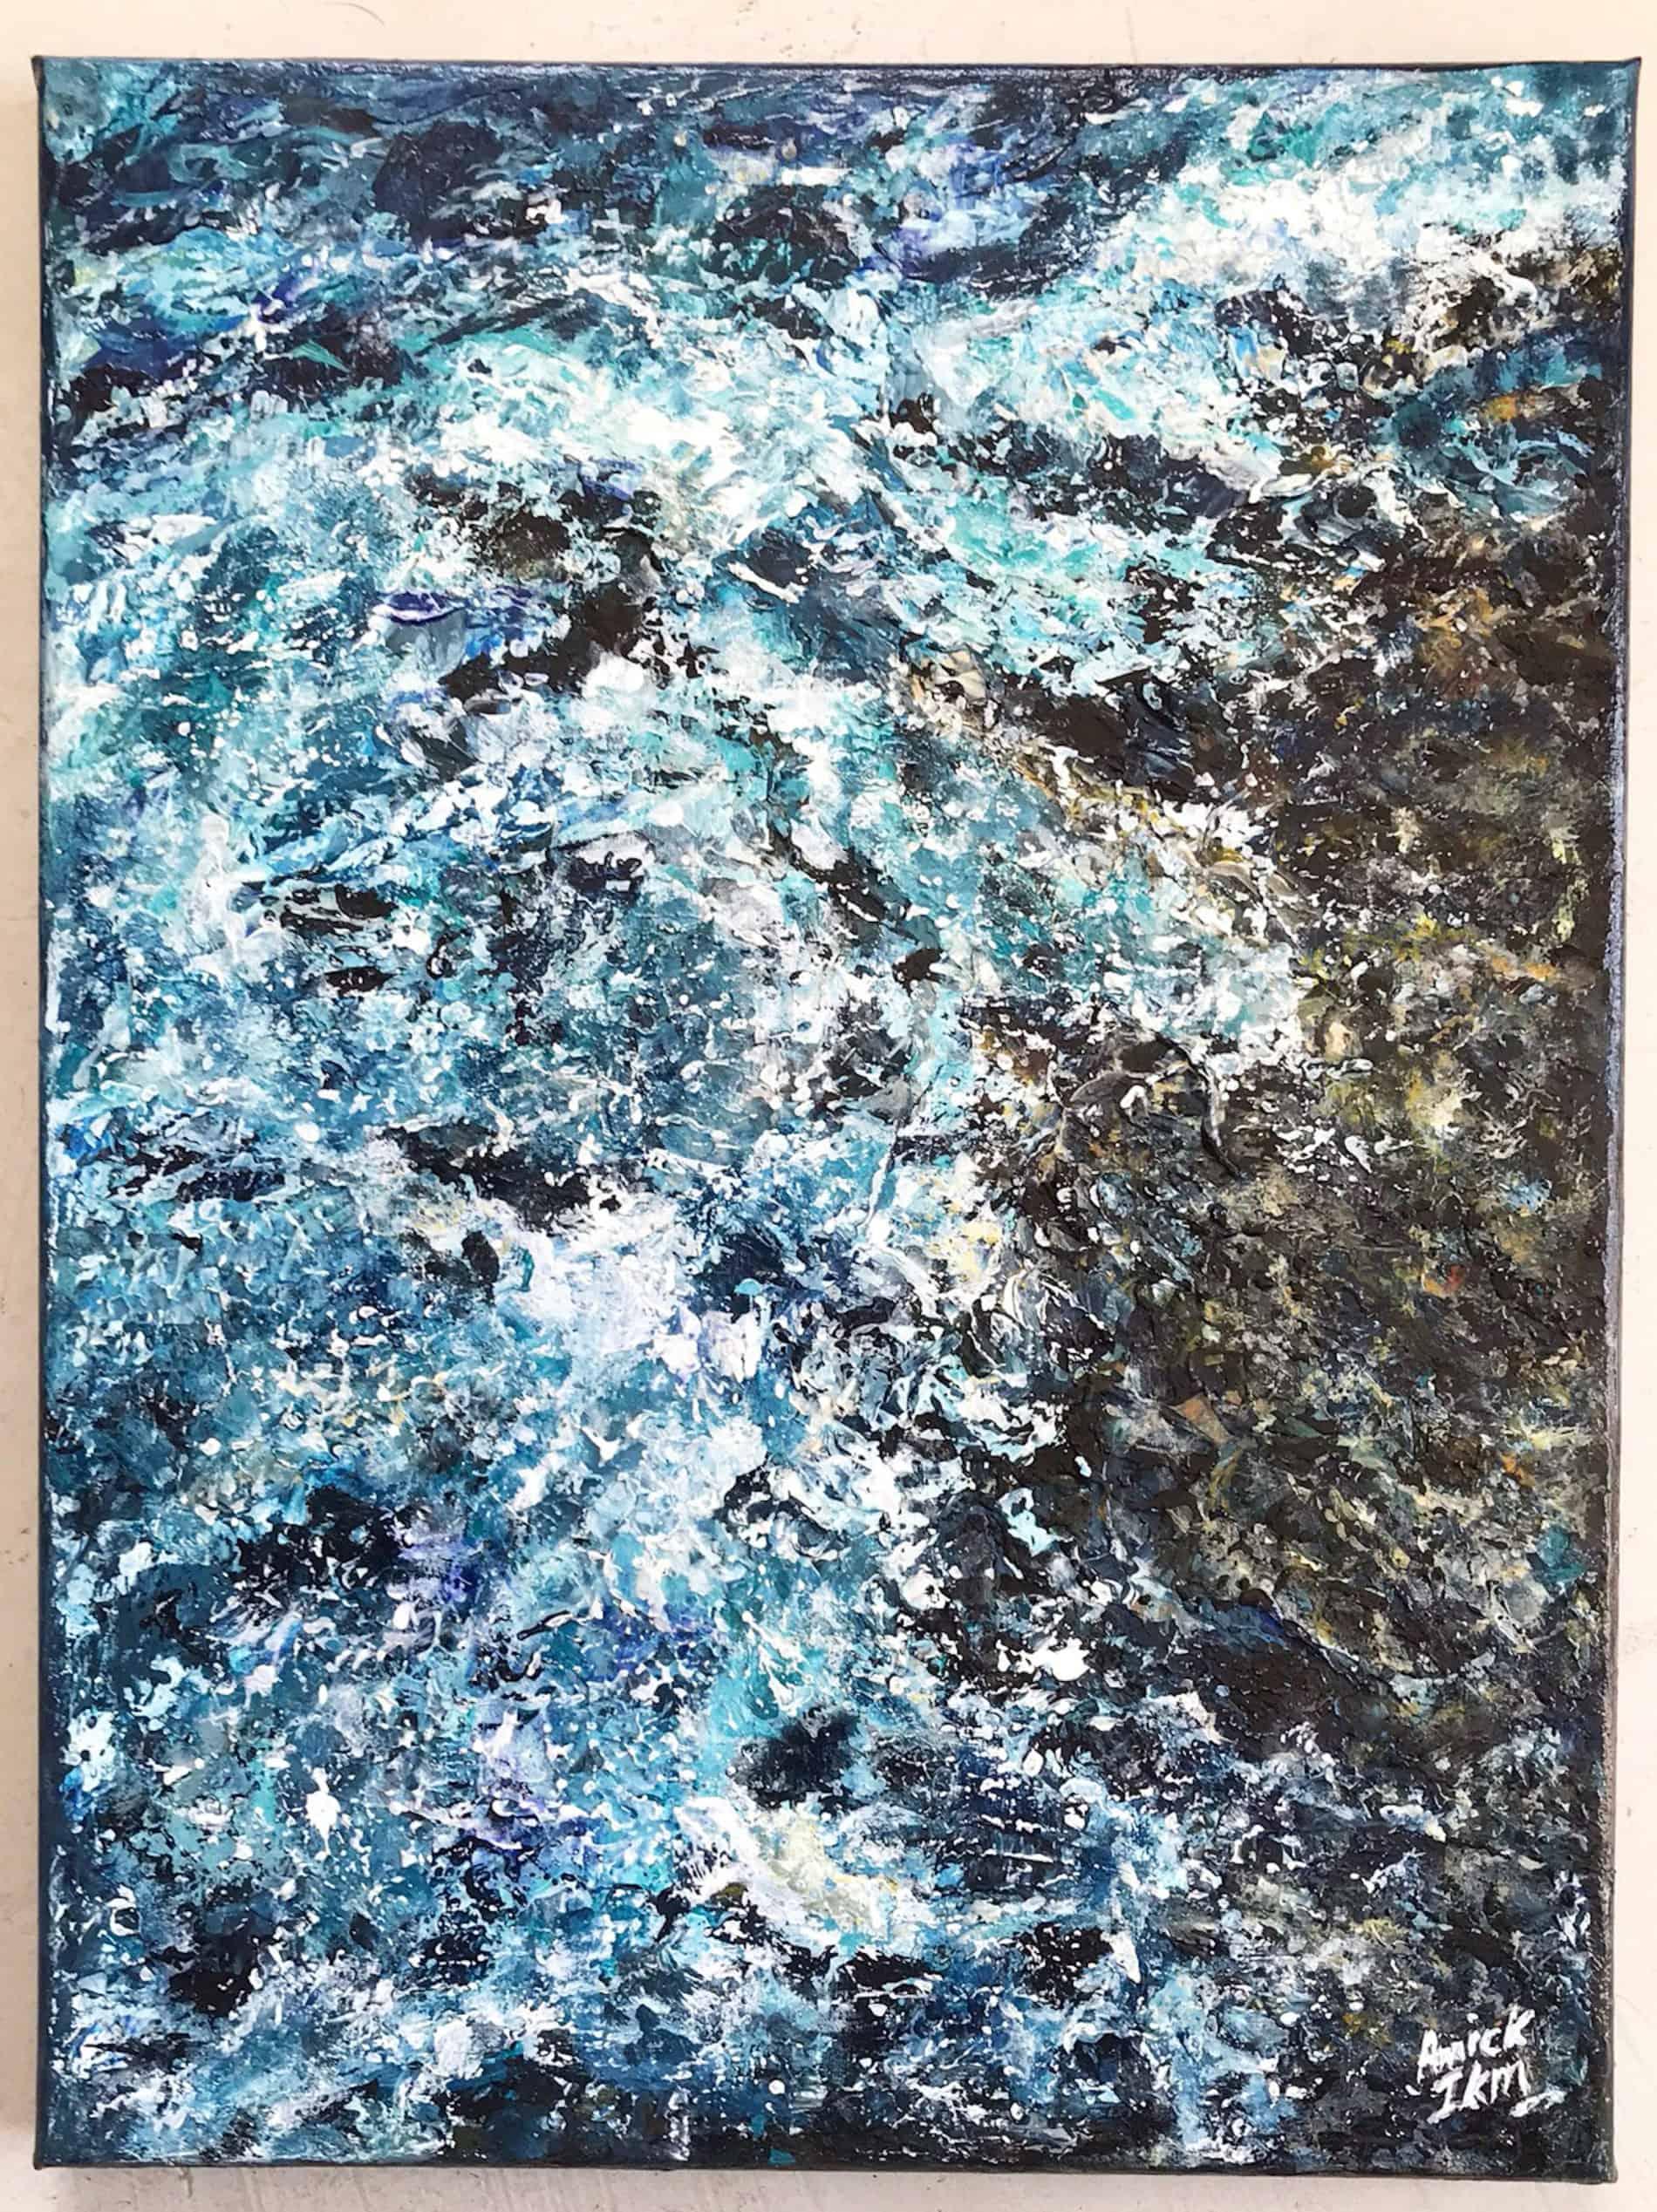 mauritius-arts-annick-ip-kai-ming-rough-sea